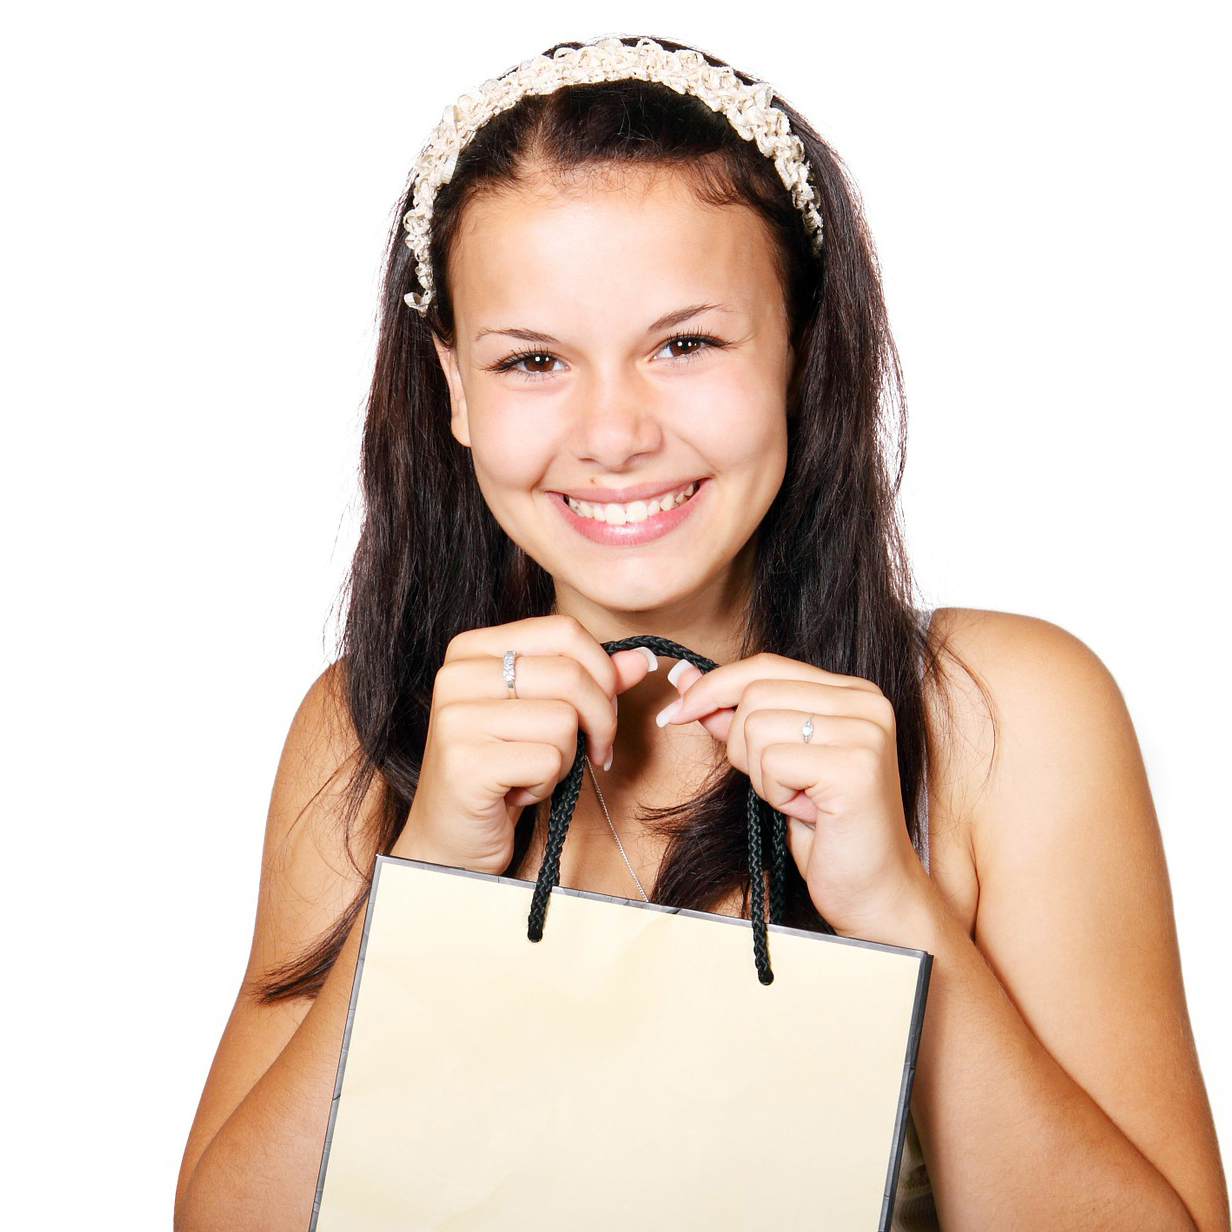 Geheimes Shopping als Therapie?